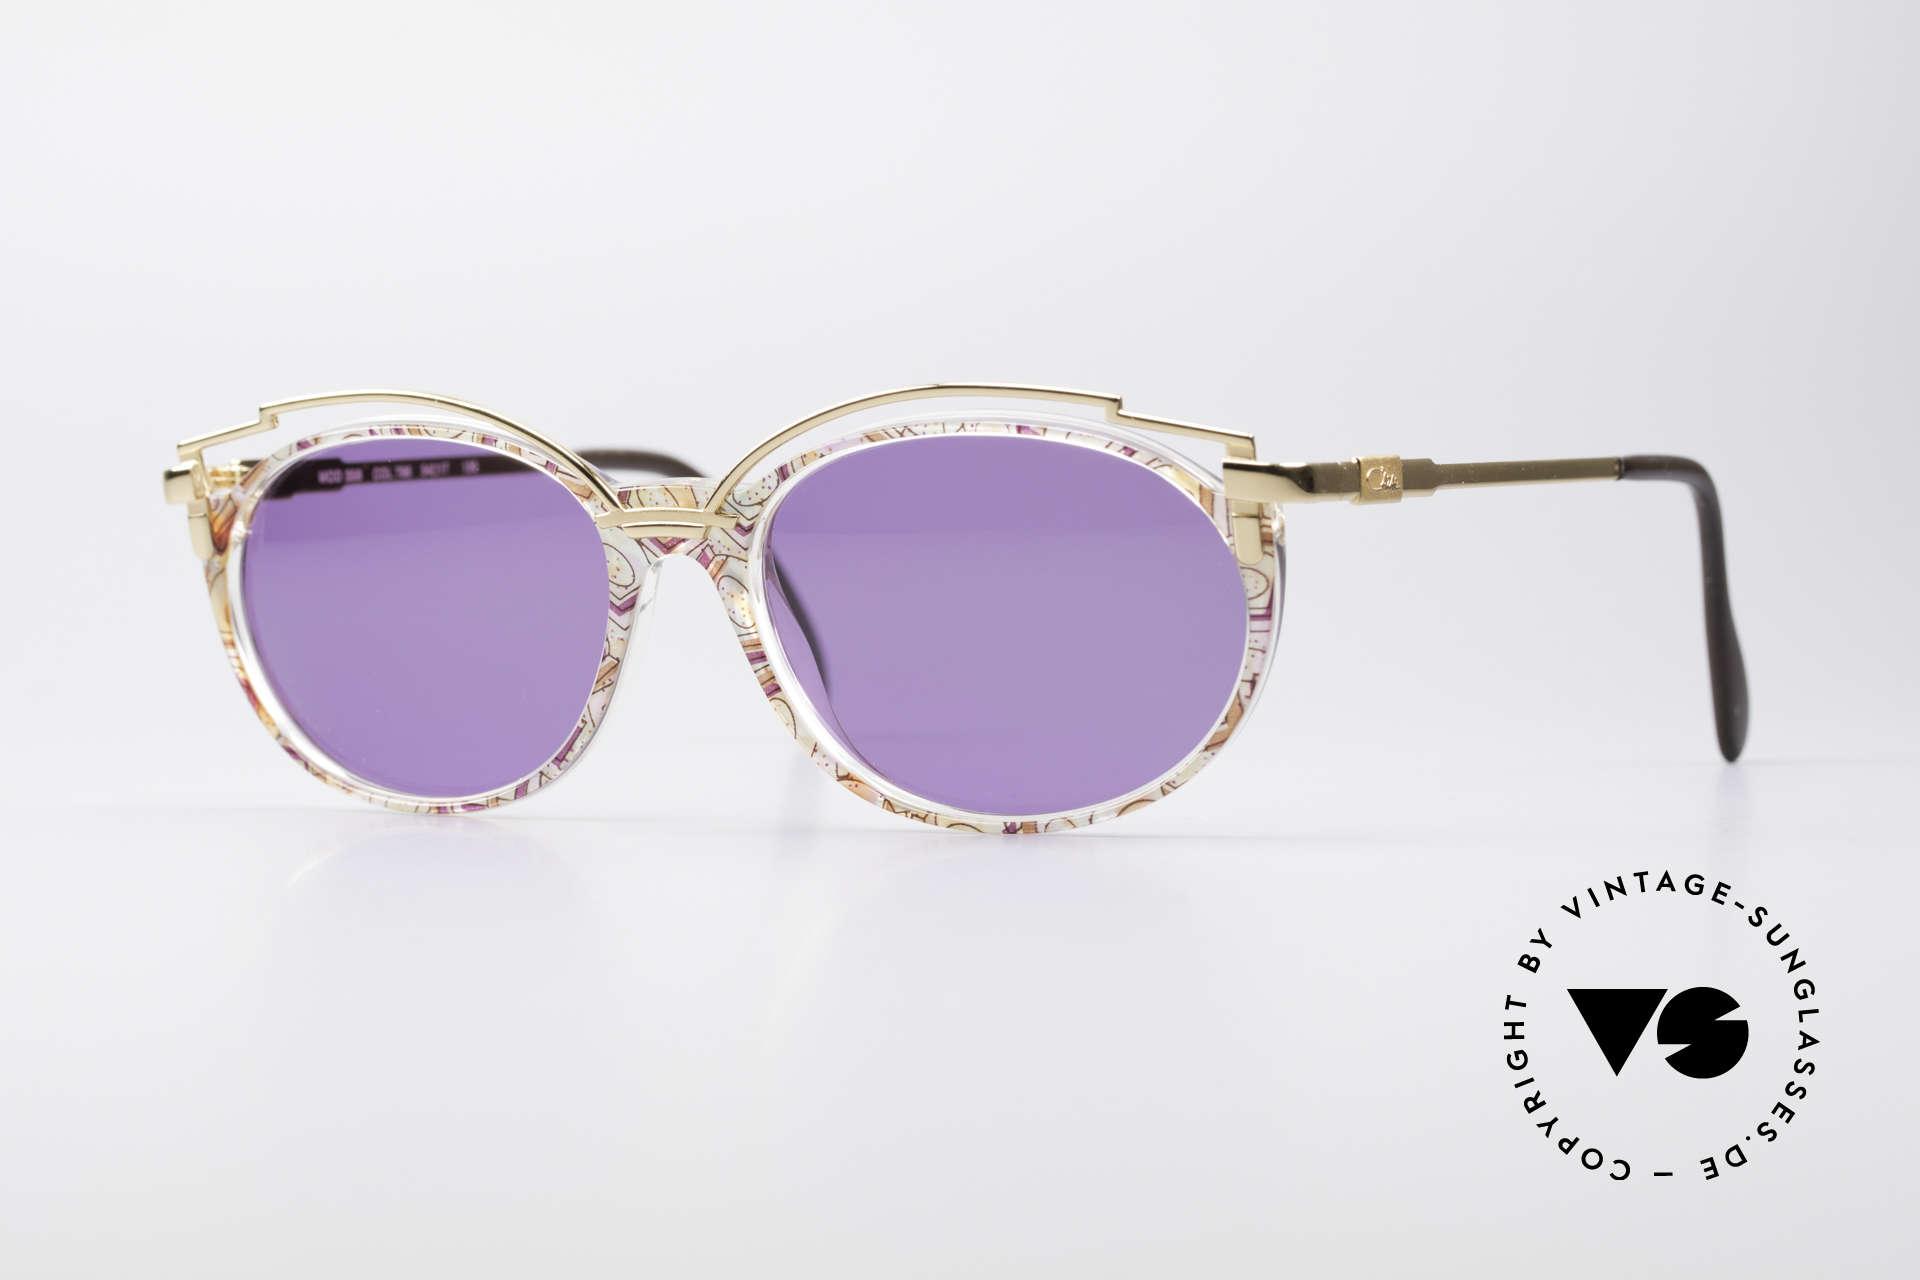 Cazal 358 Rare 90's Vintage Sunglasses, enchanting VINTAGE sunglasses from 1996 by CAZAL, Made for Women